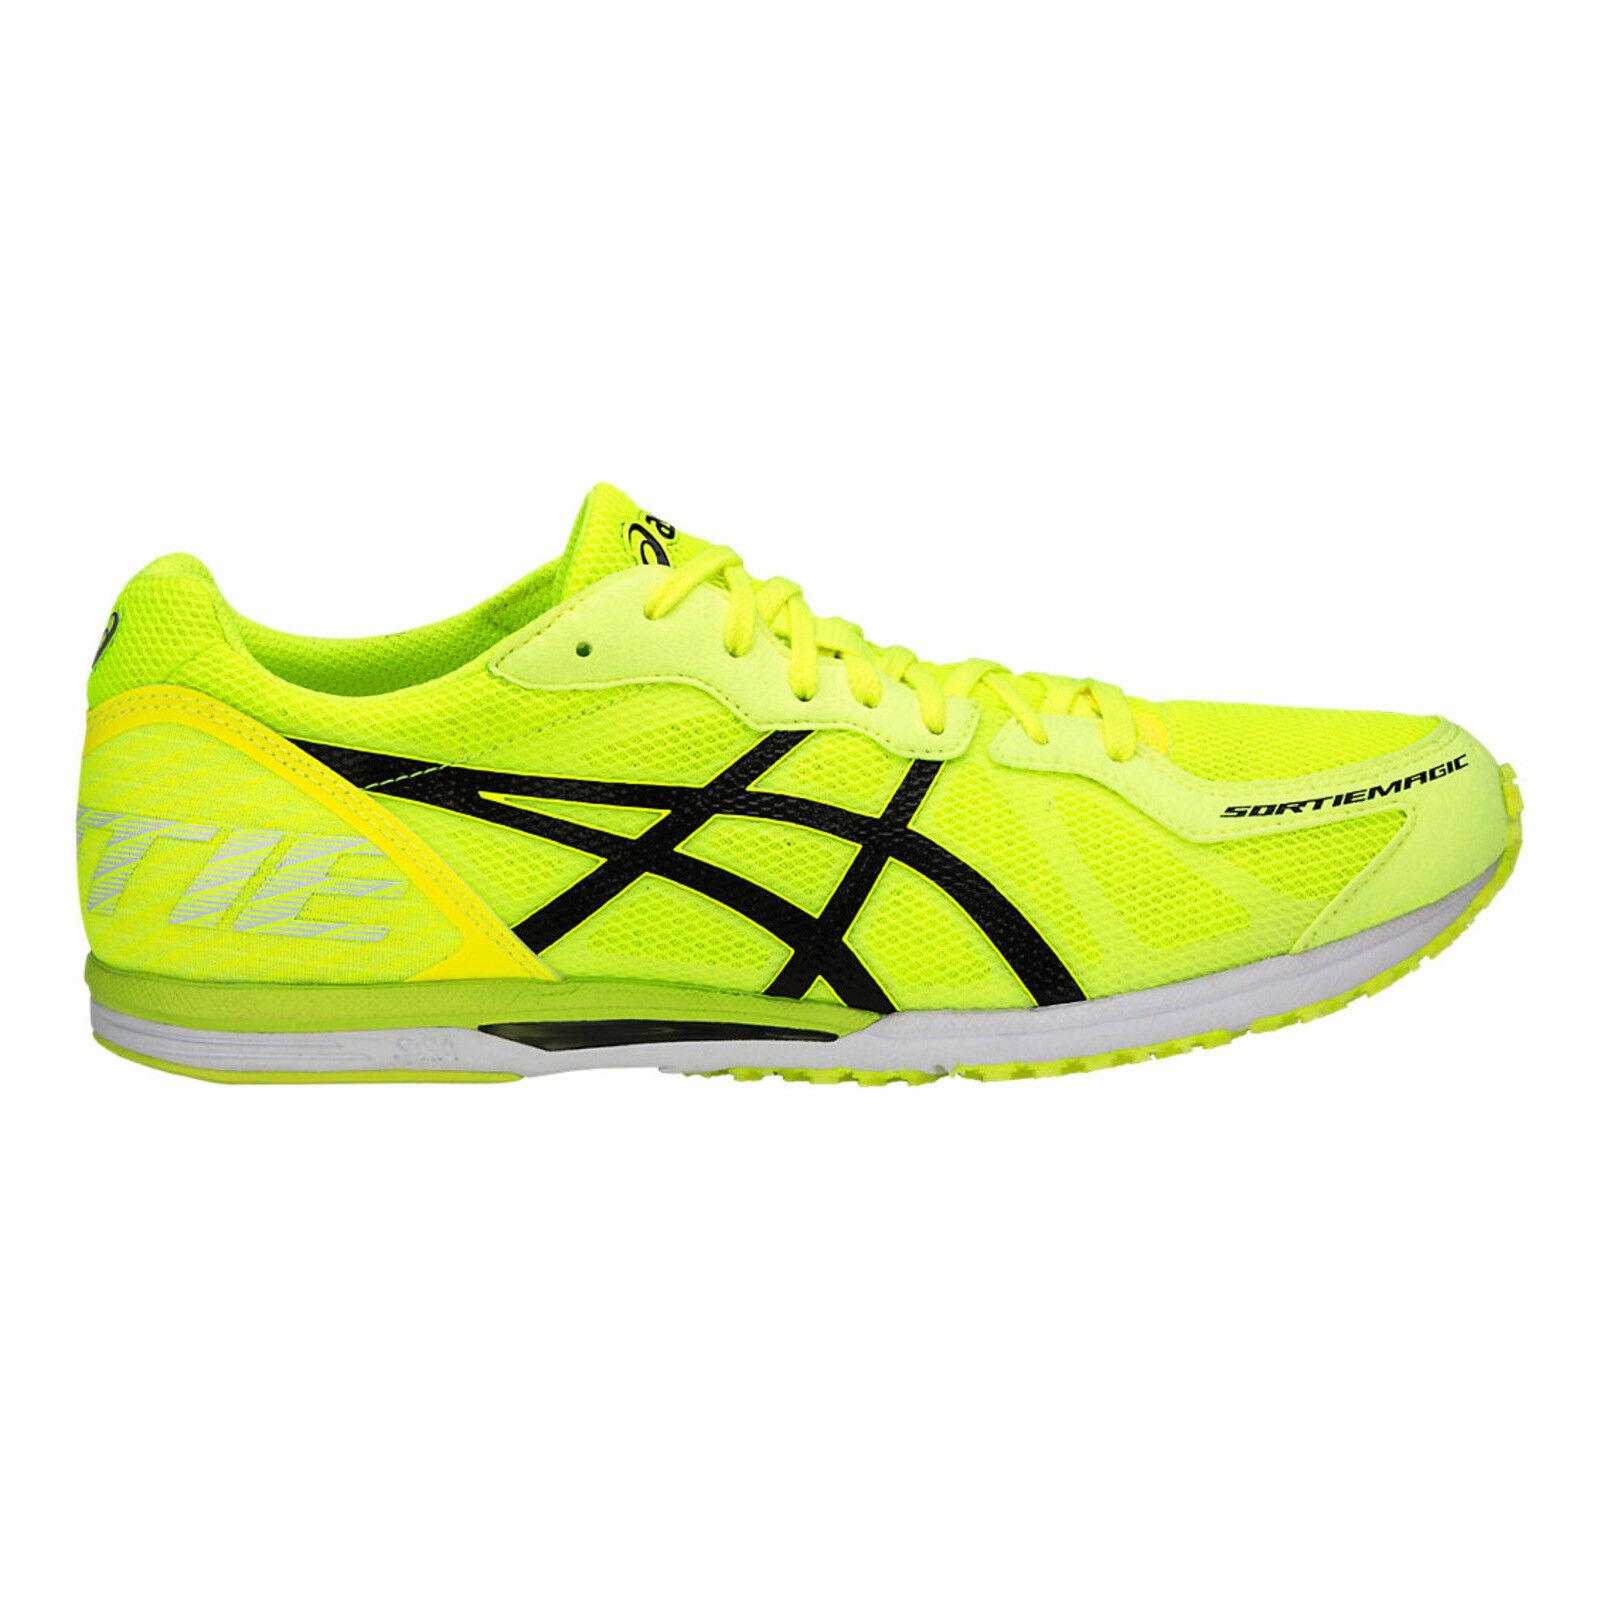 Asics Sortie Magic [TMM467-0790] Men Running Marathon Shoes Volt/Black